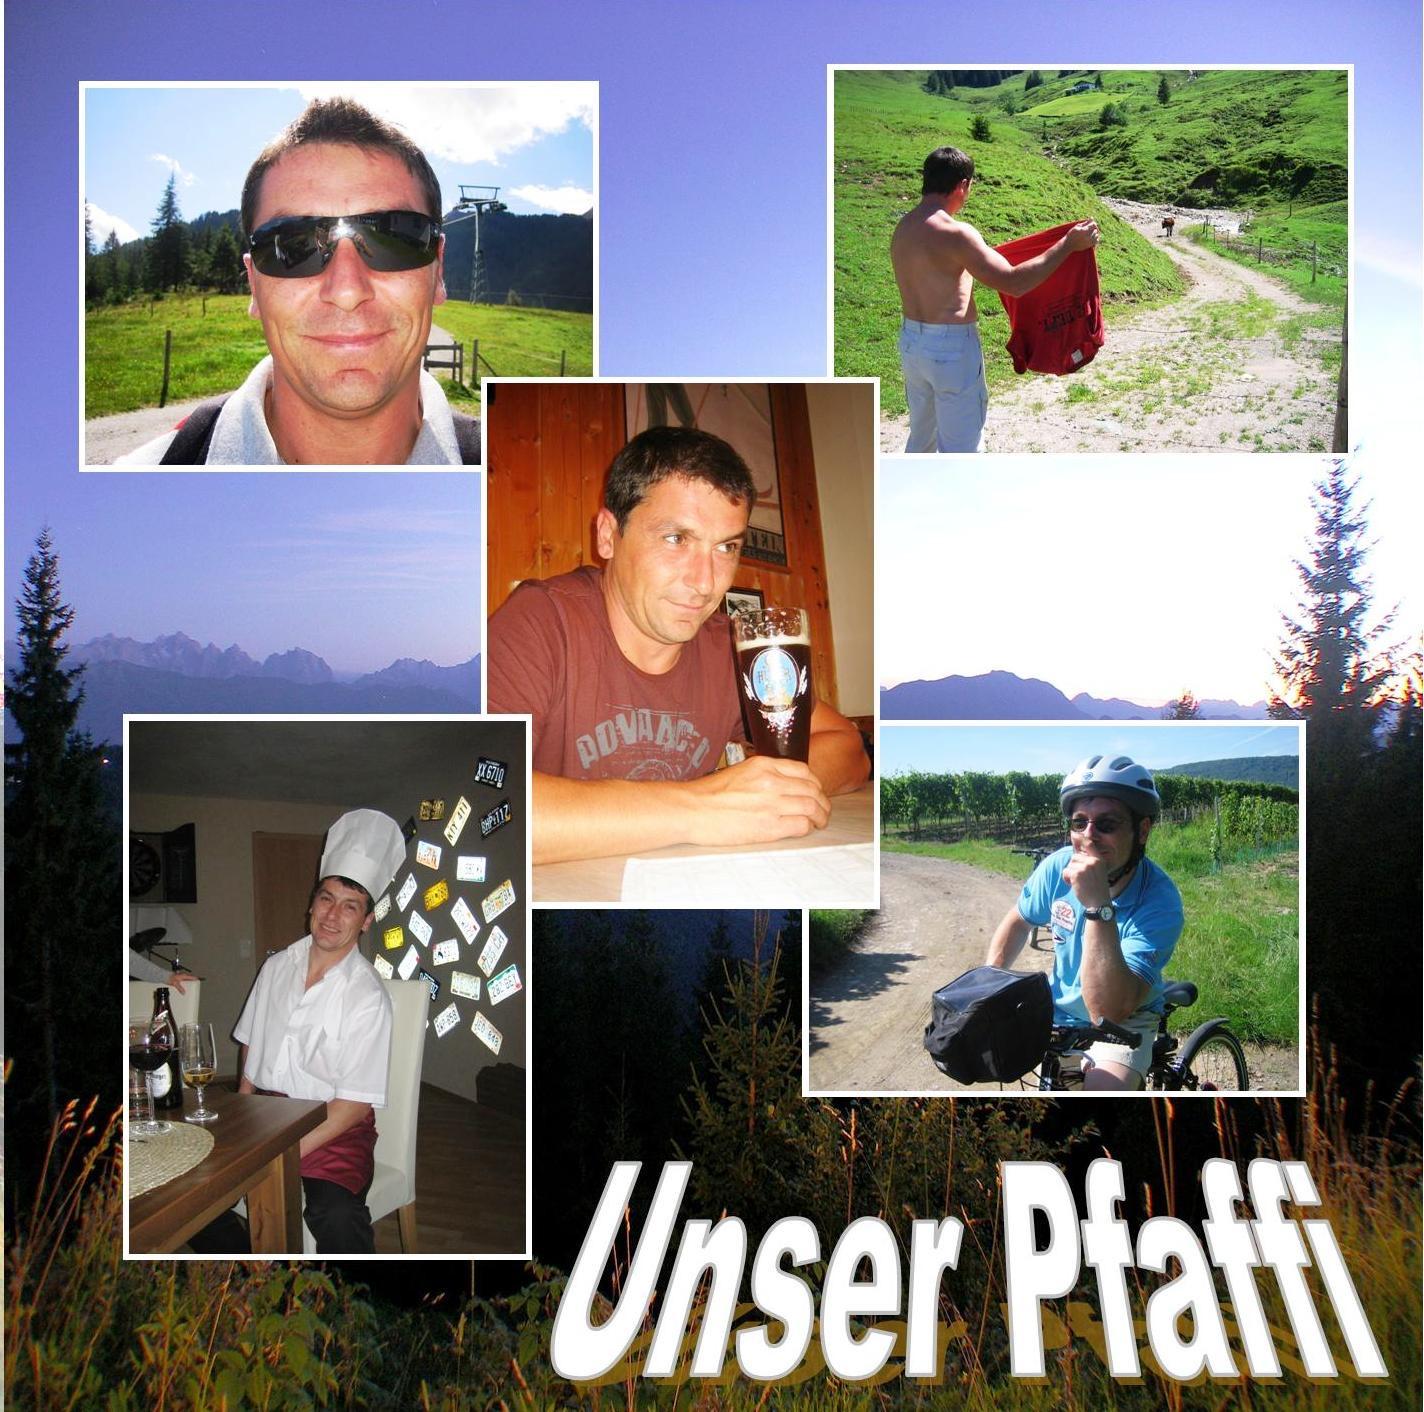 https://0501.nccdn.net/4_2/000/000/086/b99/Unser-Pfaffi--Cover-vorne--1424x1412.jpg